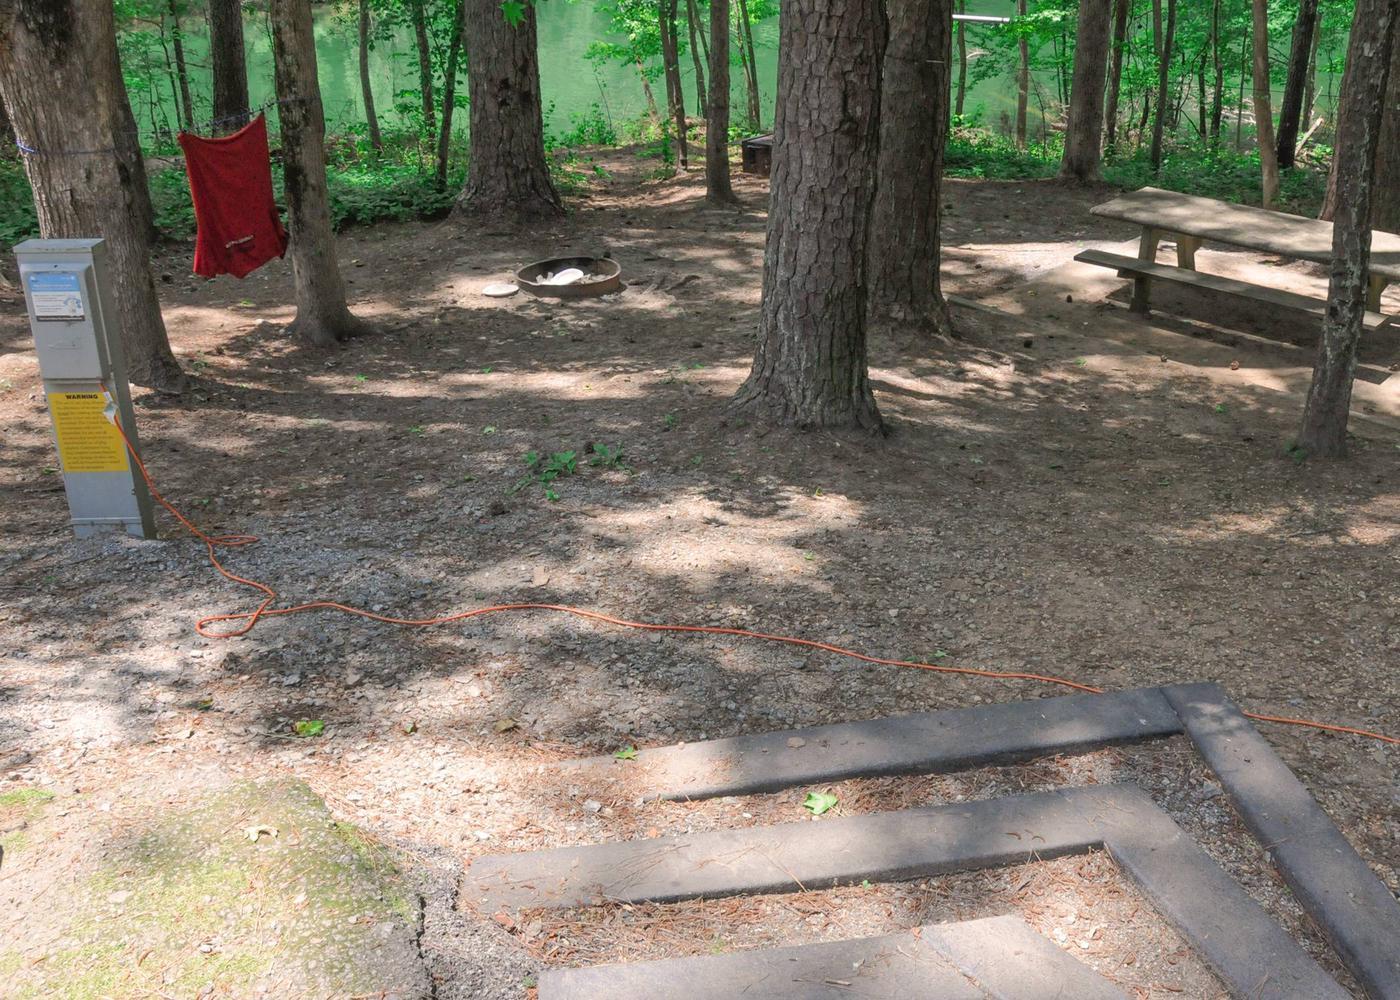 Campsite view.McKaskey Creek Campground, campsite 44.